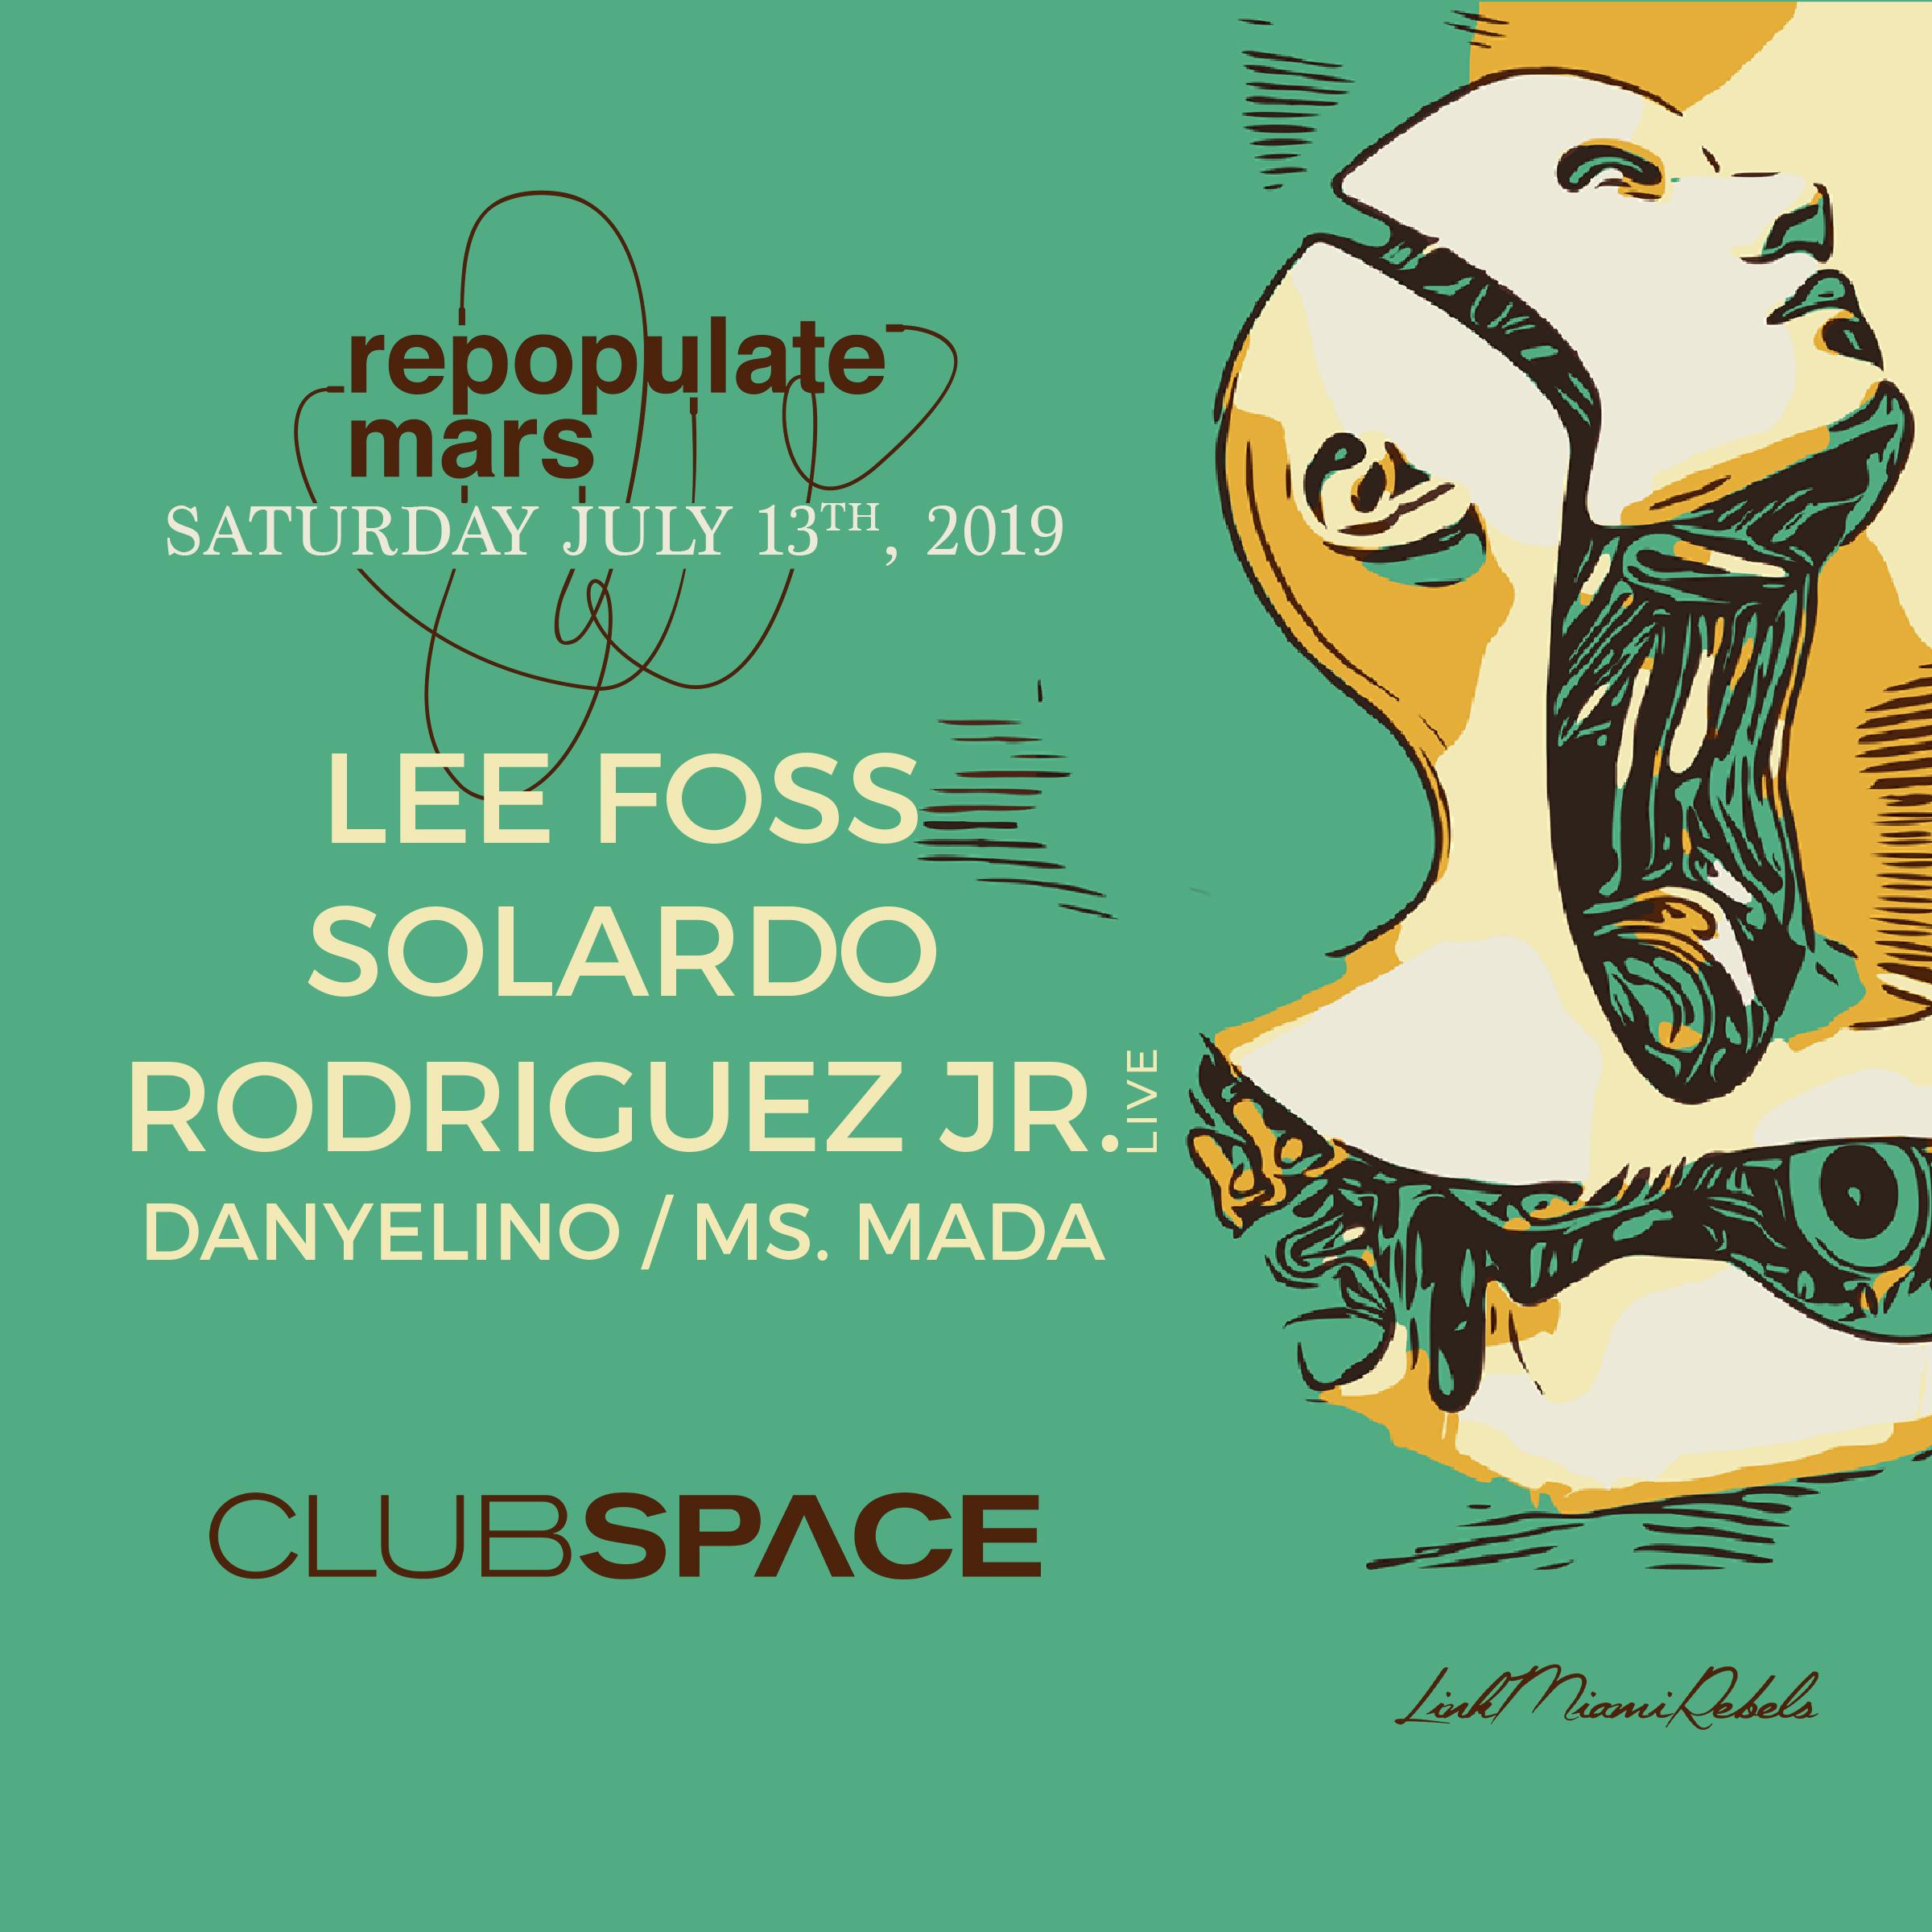 Tickets - Club Space 34 NE 11th StreetMiami, Florida33132Lineup:Lee FossSolardoRodriguez Jr. (Live)DanyelinoMs. Mada